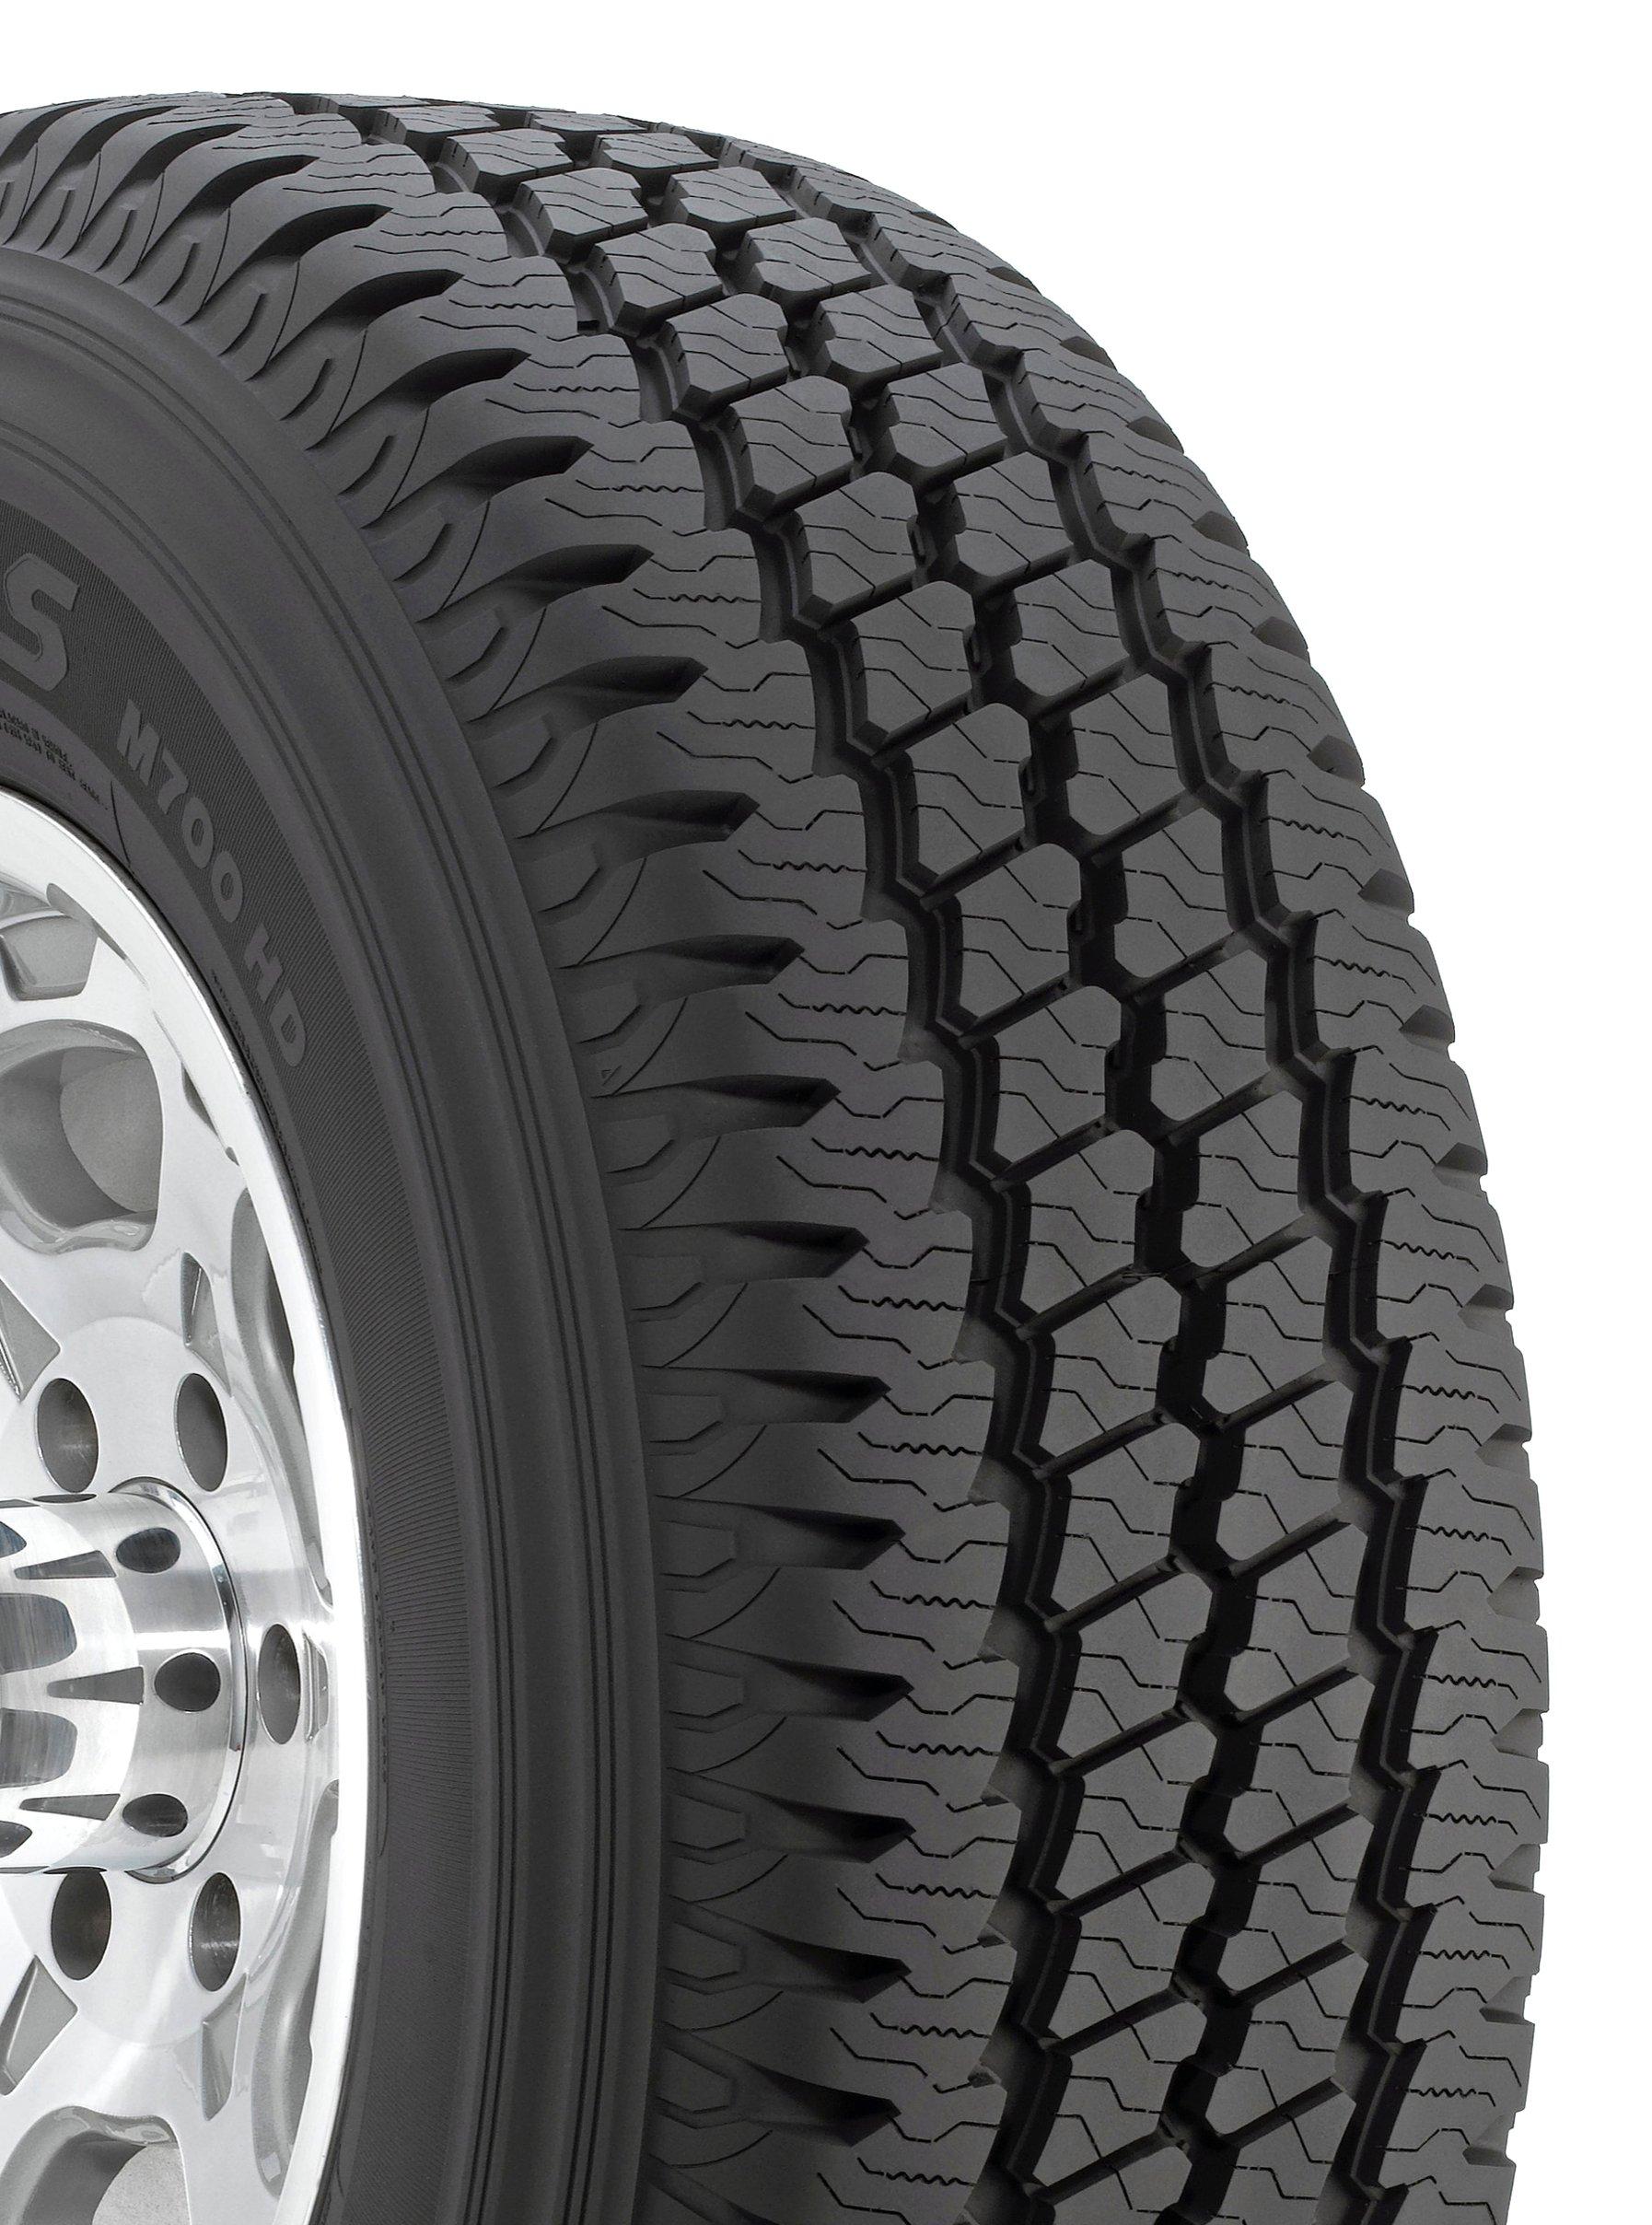 Bridgestone Duravis M700 HD Radial Tire - 265/75R16 123R by Bridgestone (Image #1)